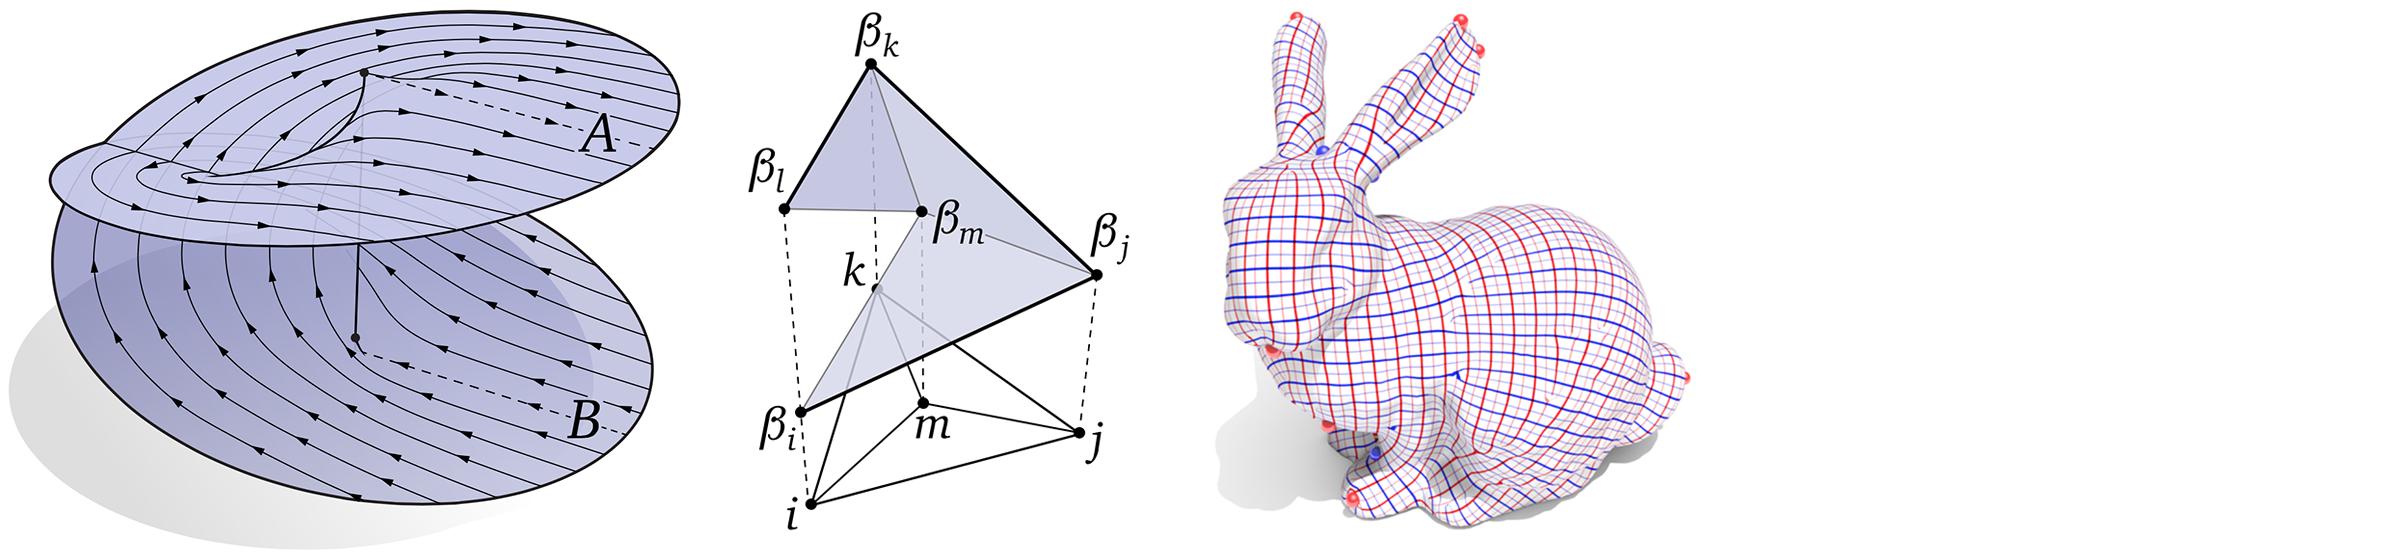 CS 15-458/858: Discrete Differential Geometry